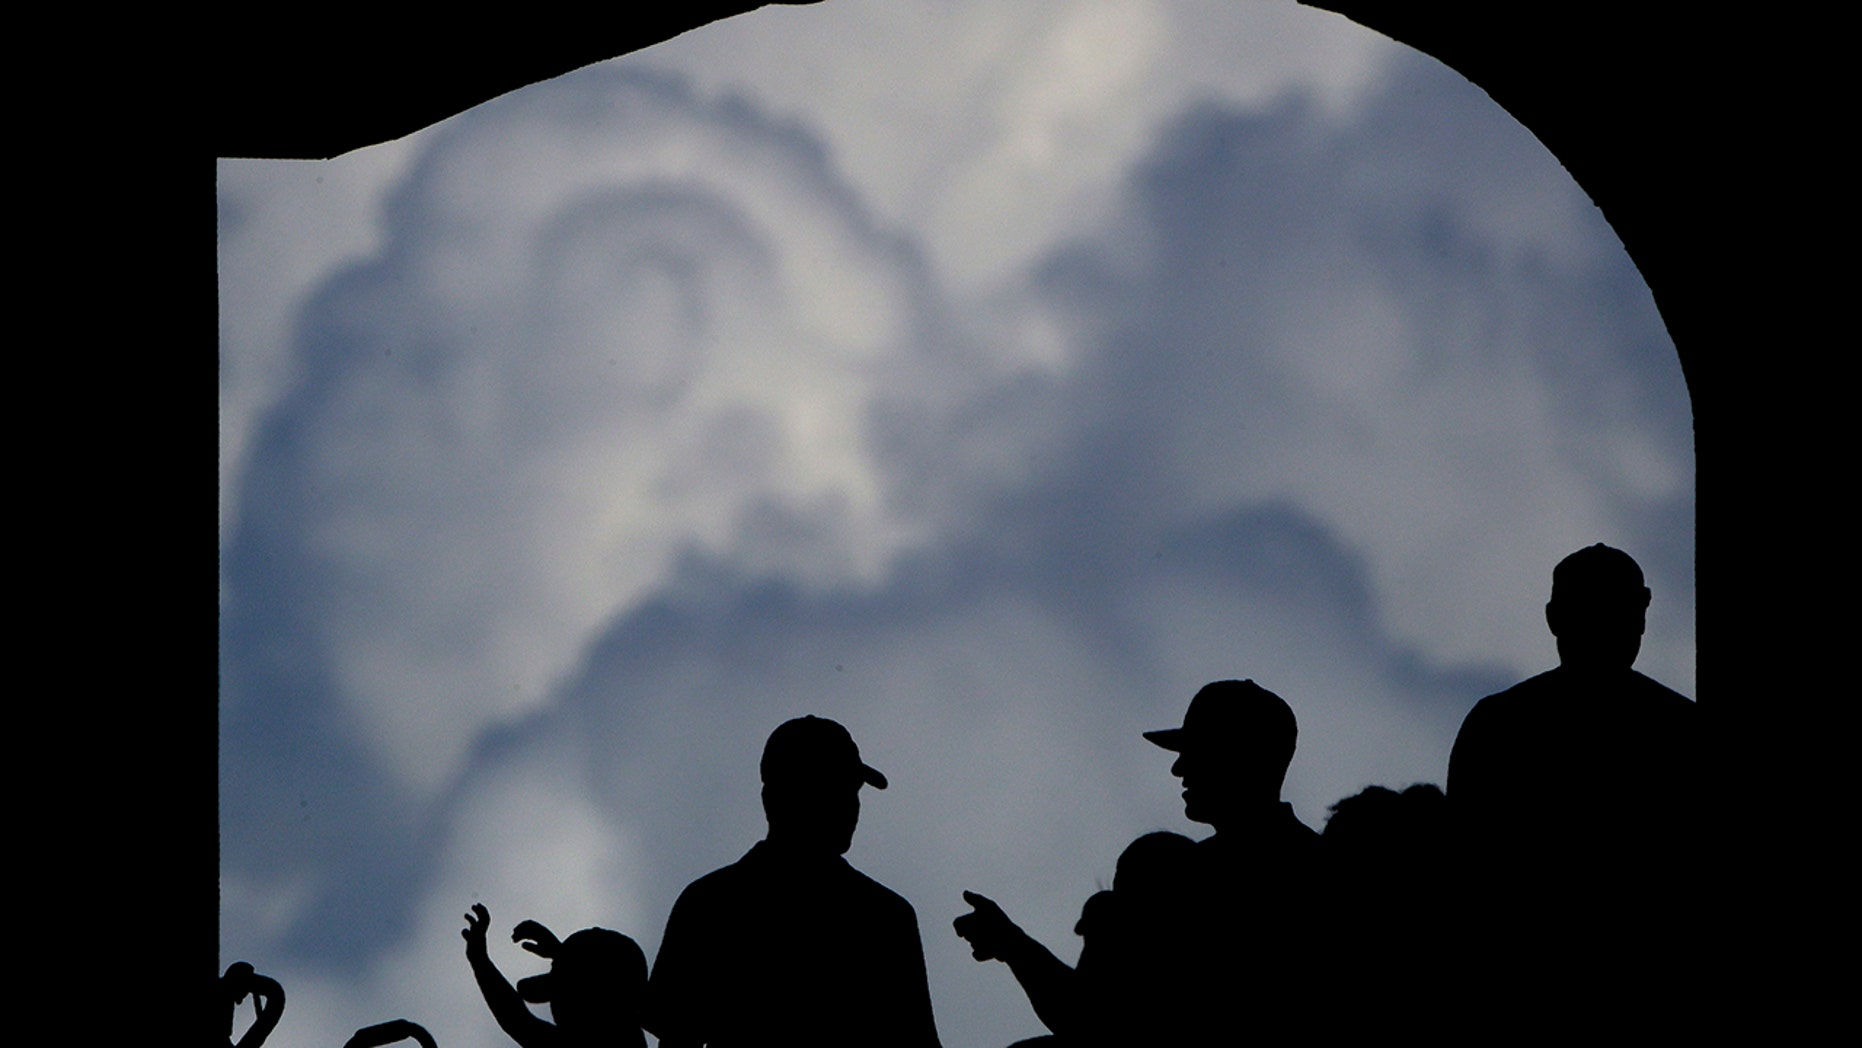 Westlake Legal Group MLB-Royals-fans Kansas City Royals will extend protective netting at stadium fox-news/sports/mlb/kansas-city-royals fox-news/sports/mlb fnc/sports fnc Associated Press article 3cb77057-3b38-5118-84fe-e40afa8d5230